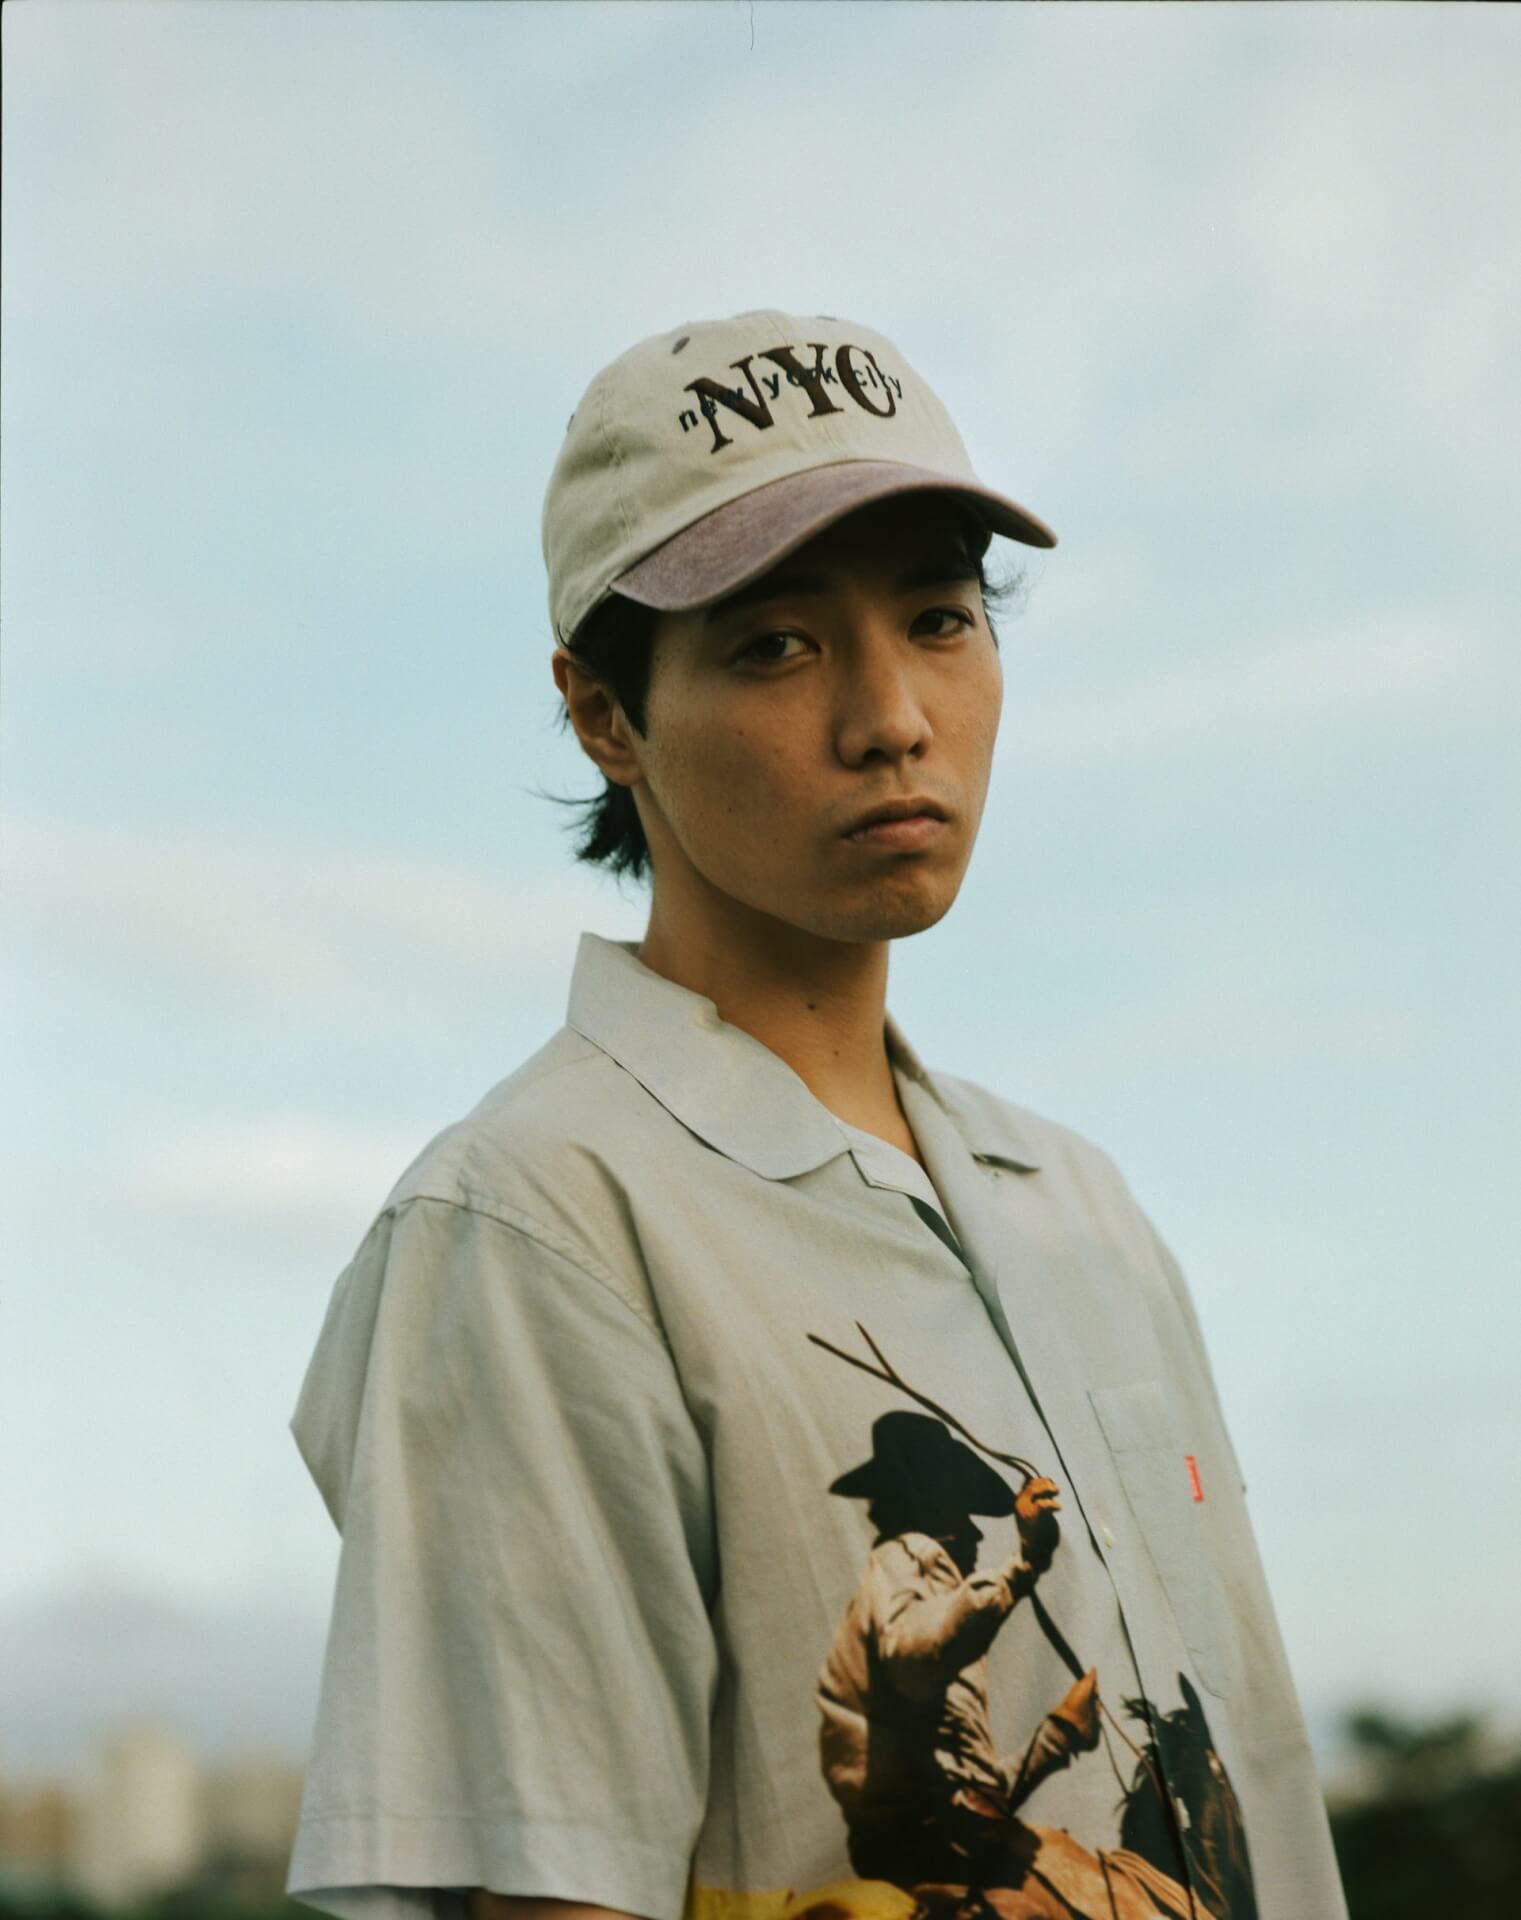 "Shin SakiuraがKANDYTOWNのRyohuを迎えた""More Life""の7インチをリリース!リミックスverもデジタル配信開始 music200701_shinsakiura_ryohu_02"